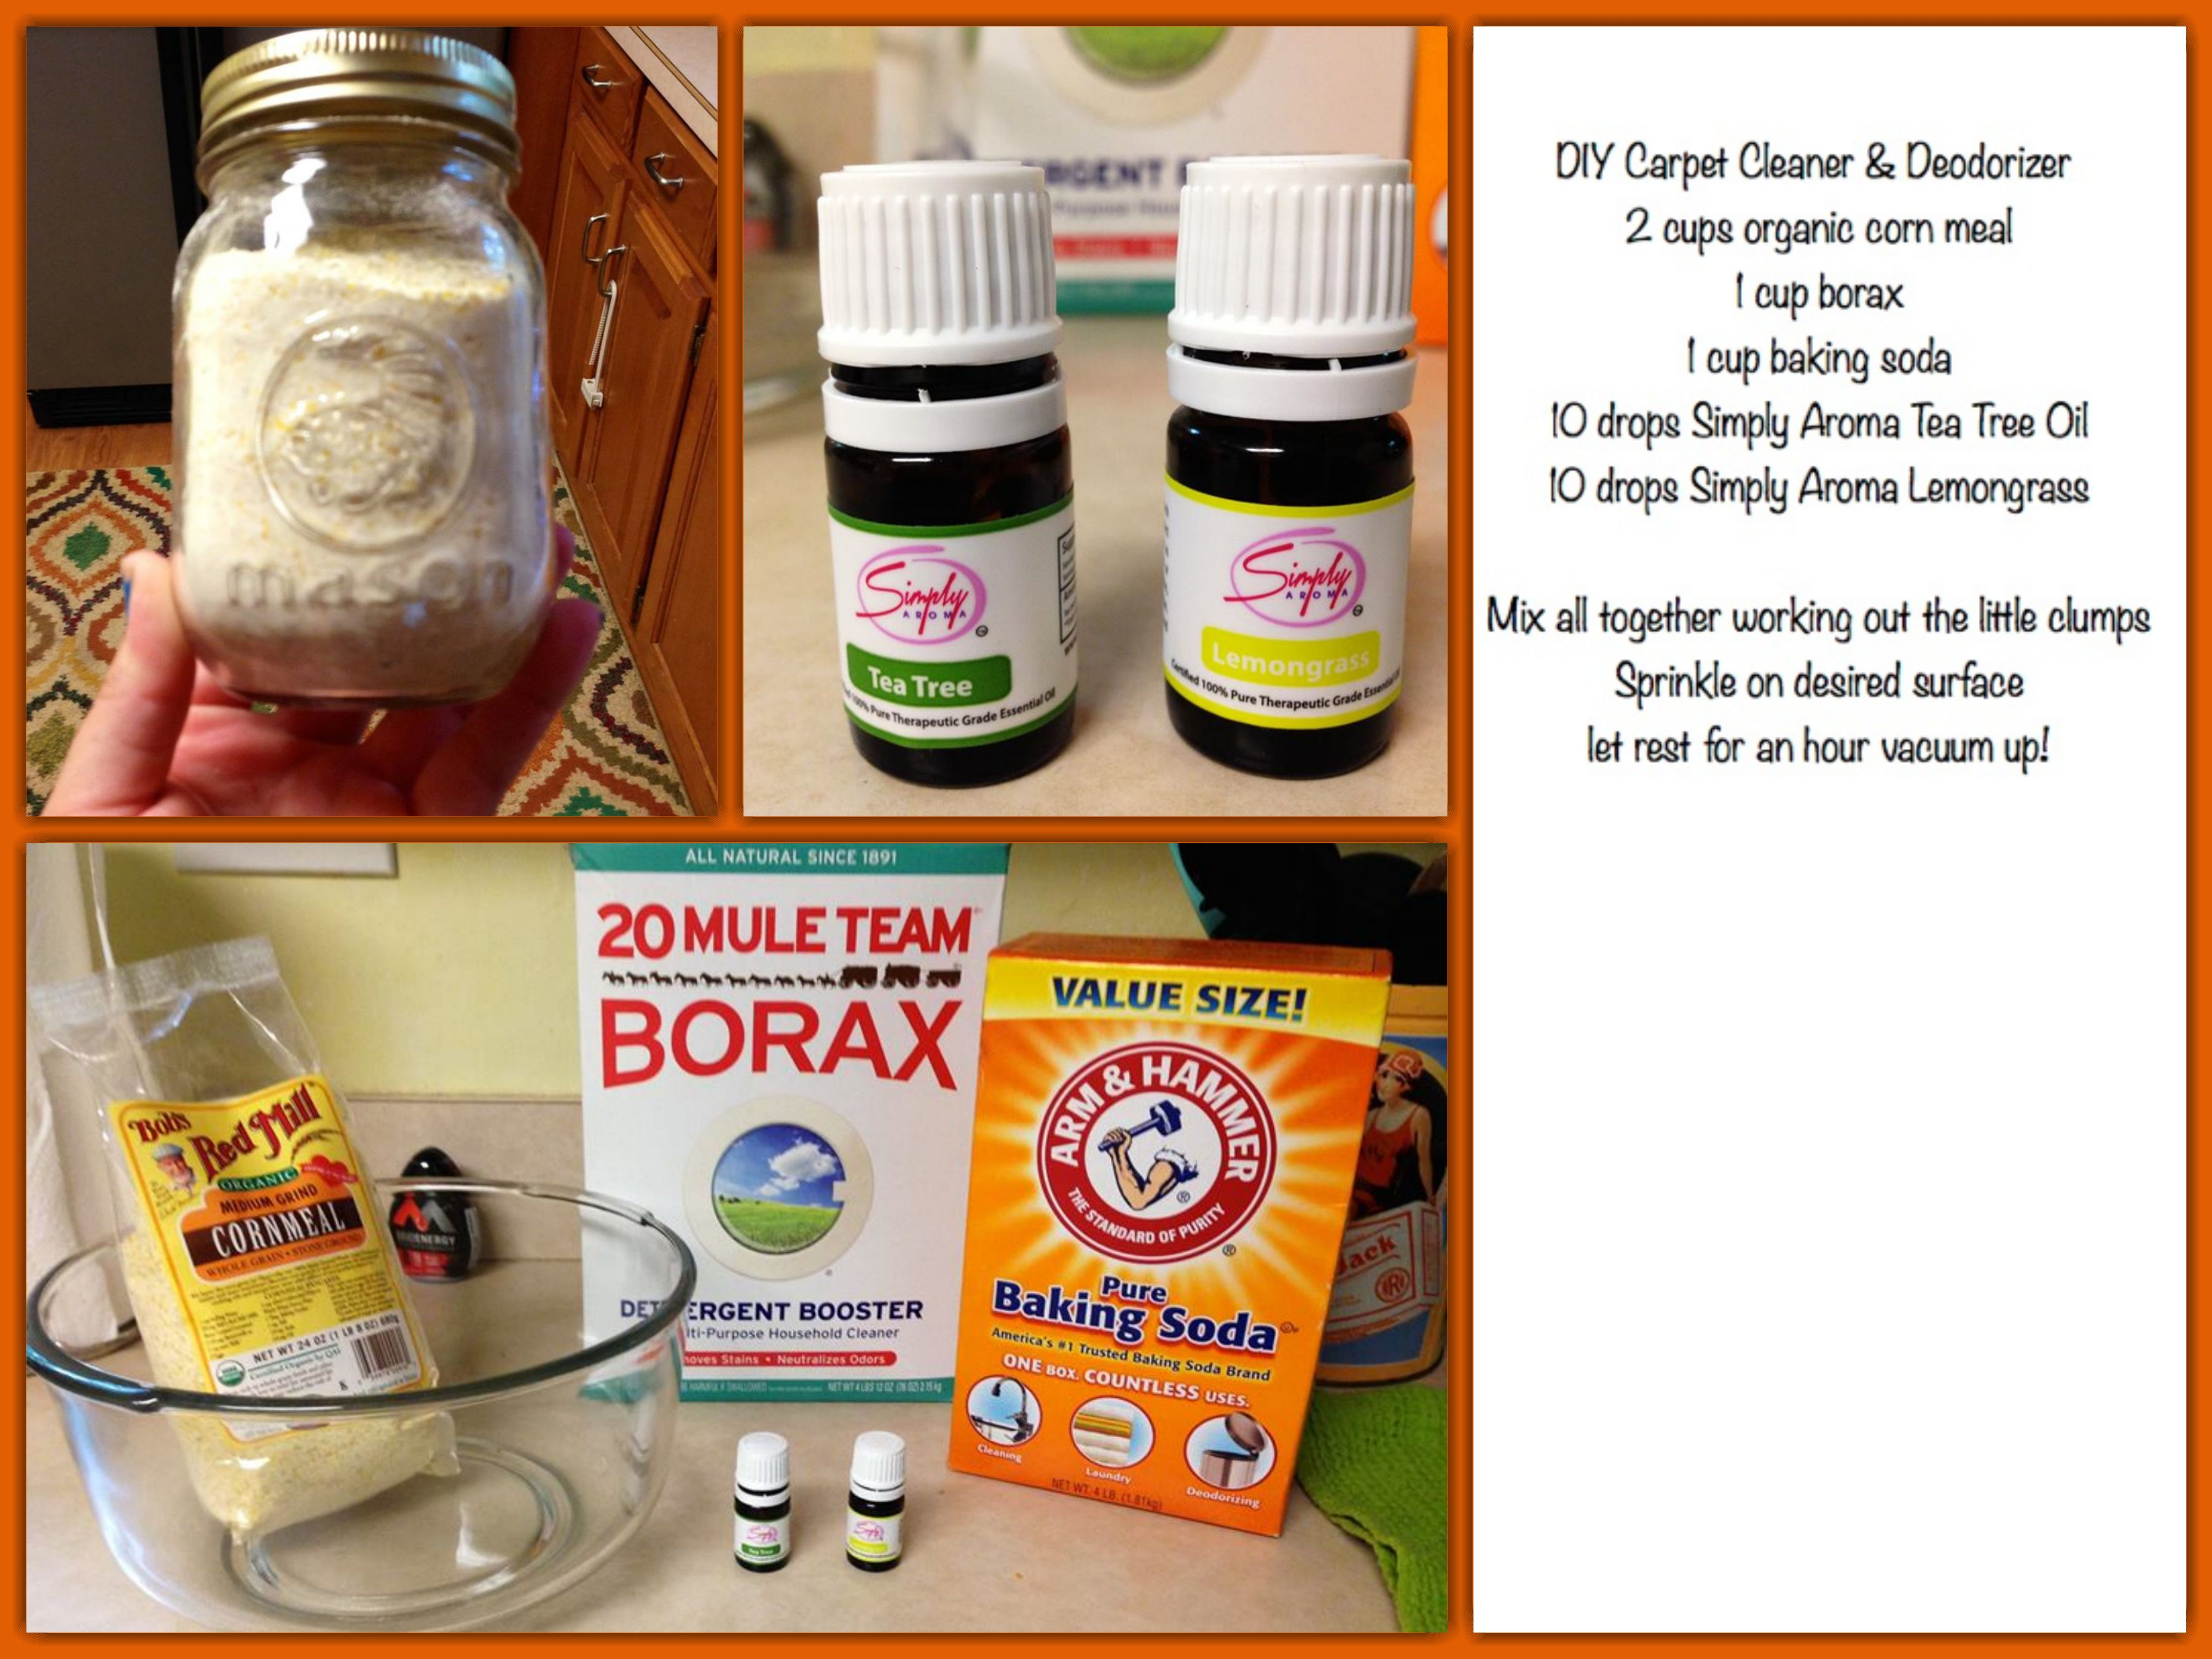 Diy Carpet Cleaner Refresher Safe Natural Borax Will Kill